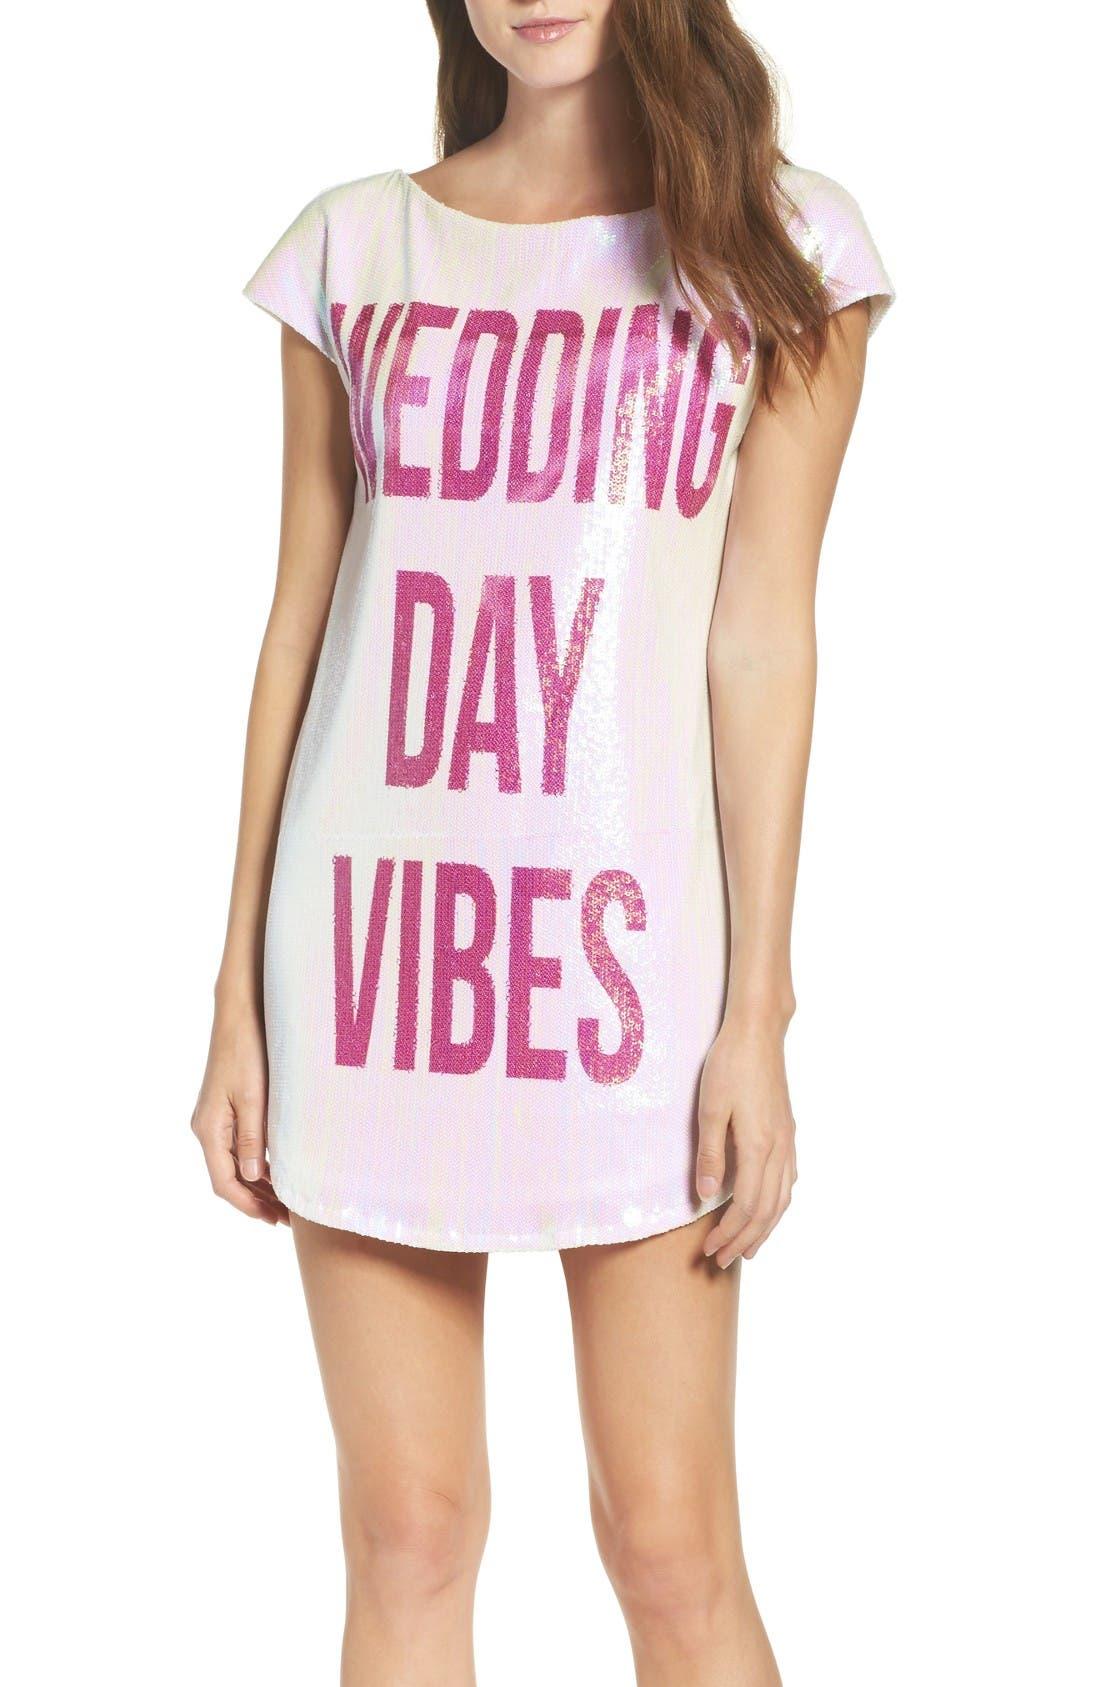 Hayley Paige Wedding Day Vibes Dress